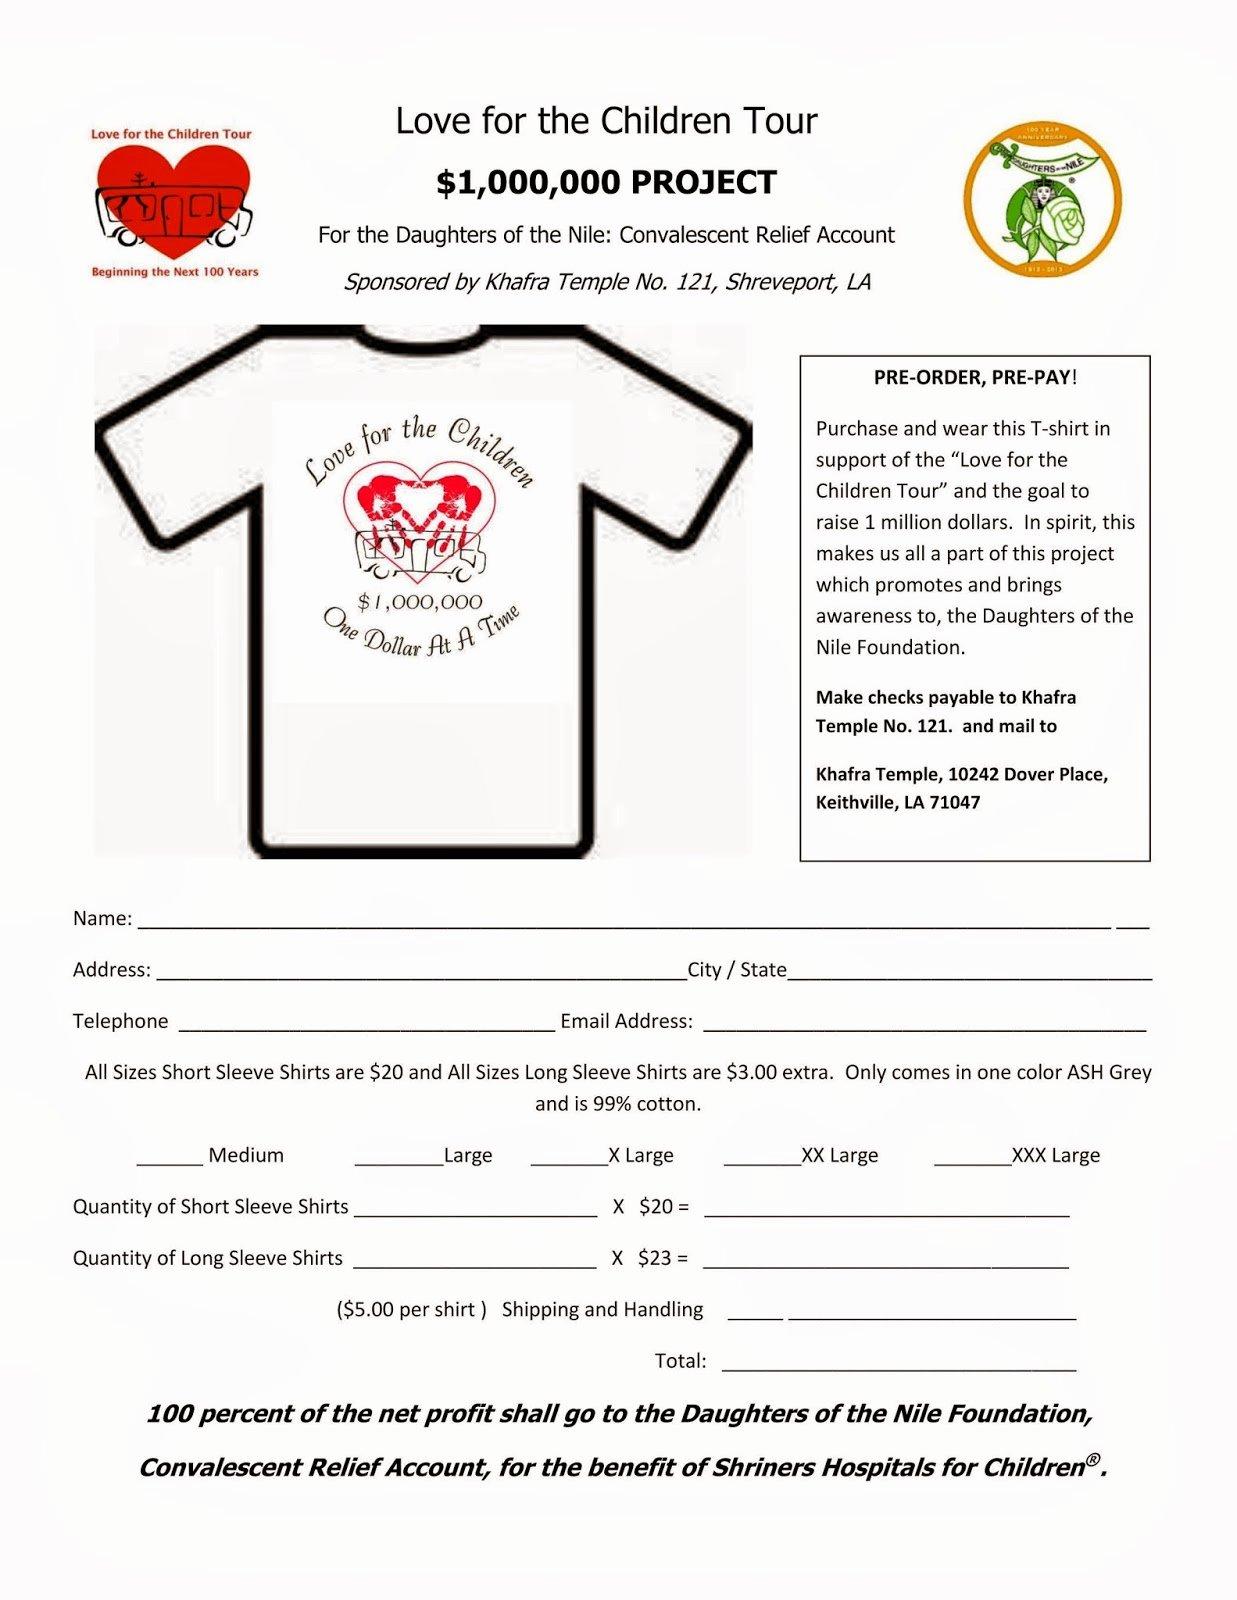 T Shirt Invoice Template Elegant Blank Template Shirt order form